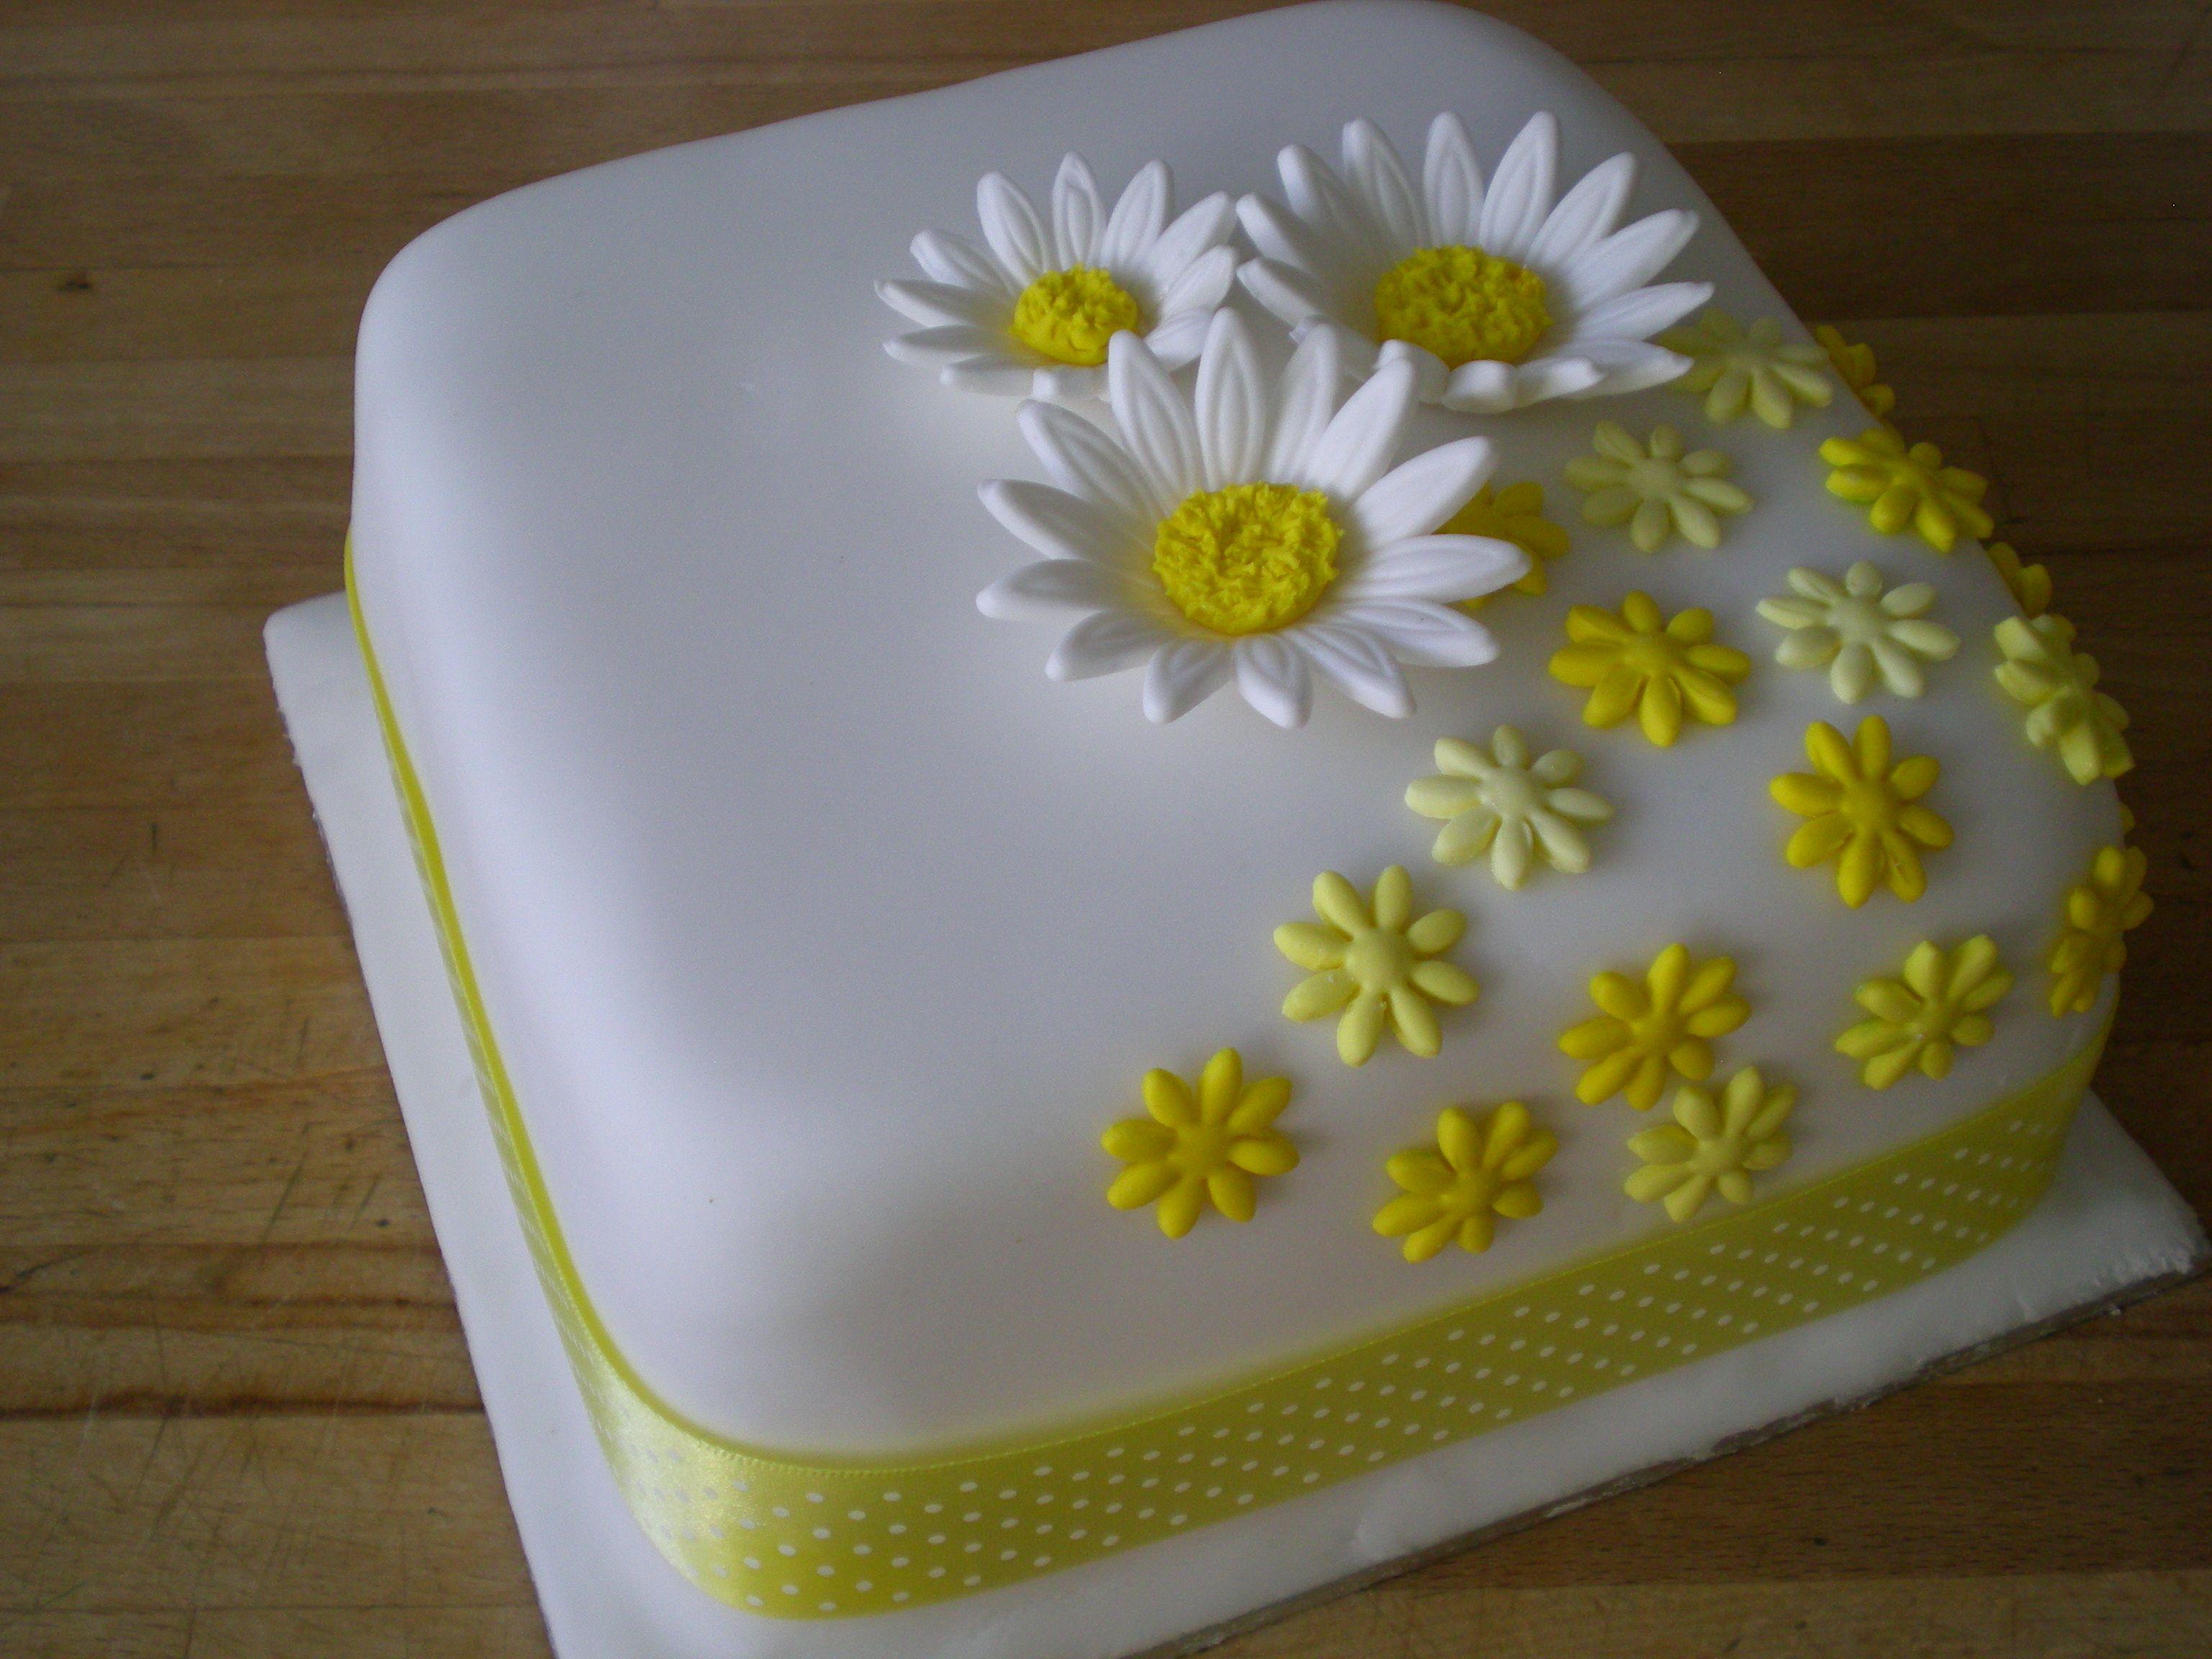 Phenomenal Daisy Birthday Cake Birthday Cakes For Women Birthday Cake Funny Birthday Cards Online Alyptdamsfinfo